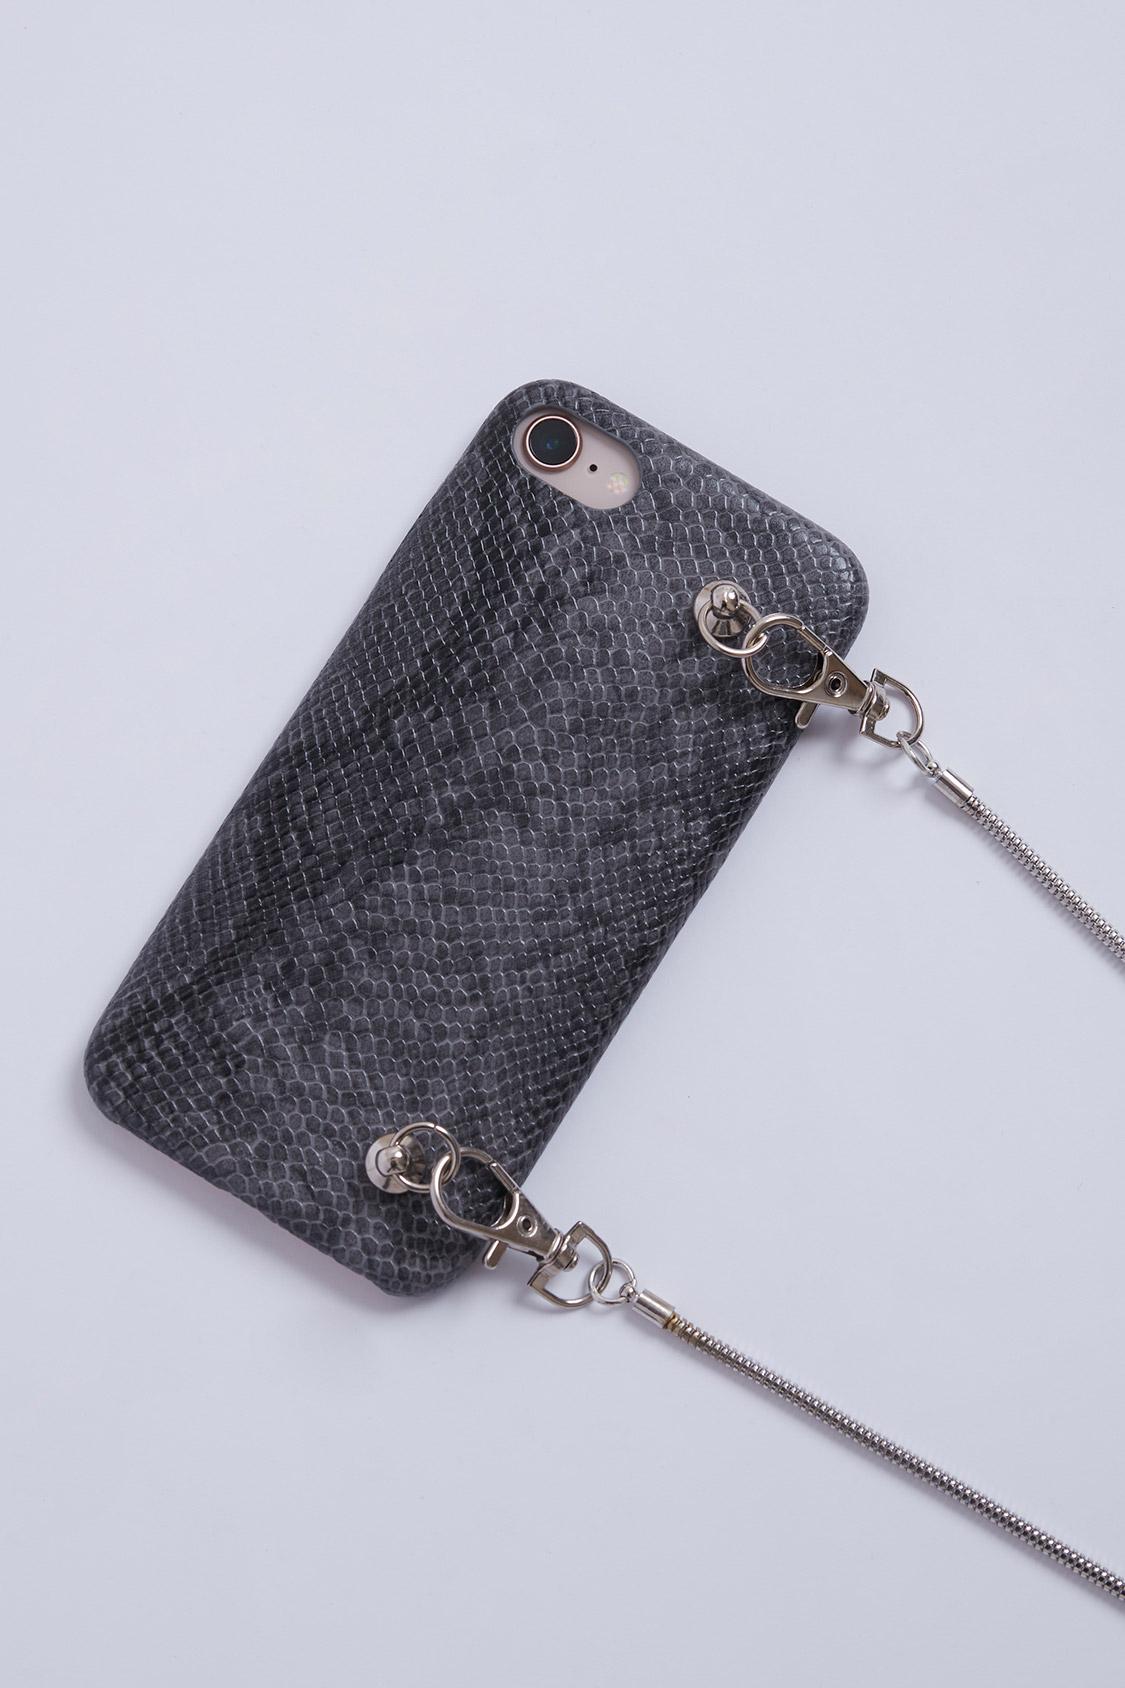 Cover catena - Iphone 7/8